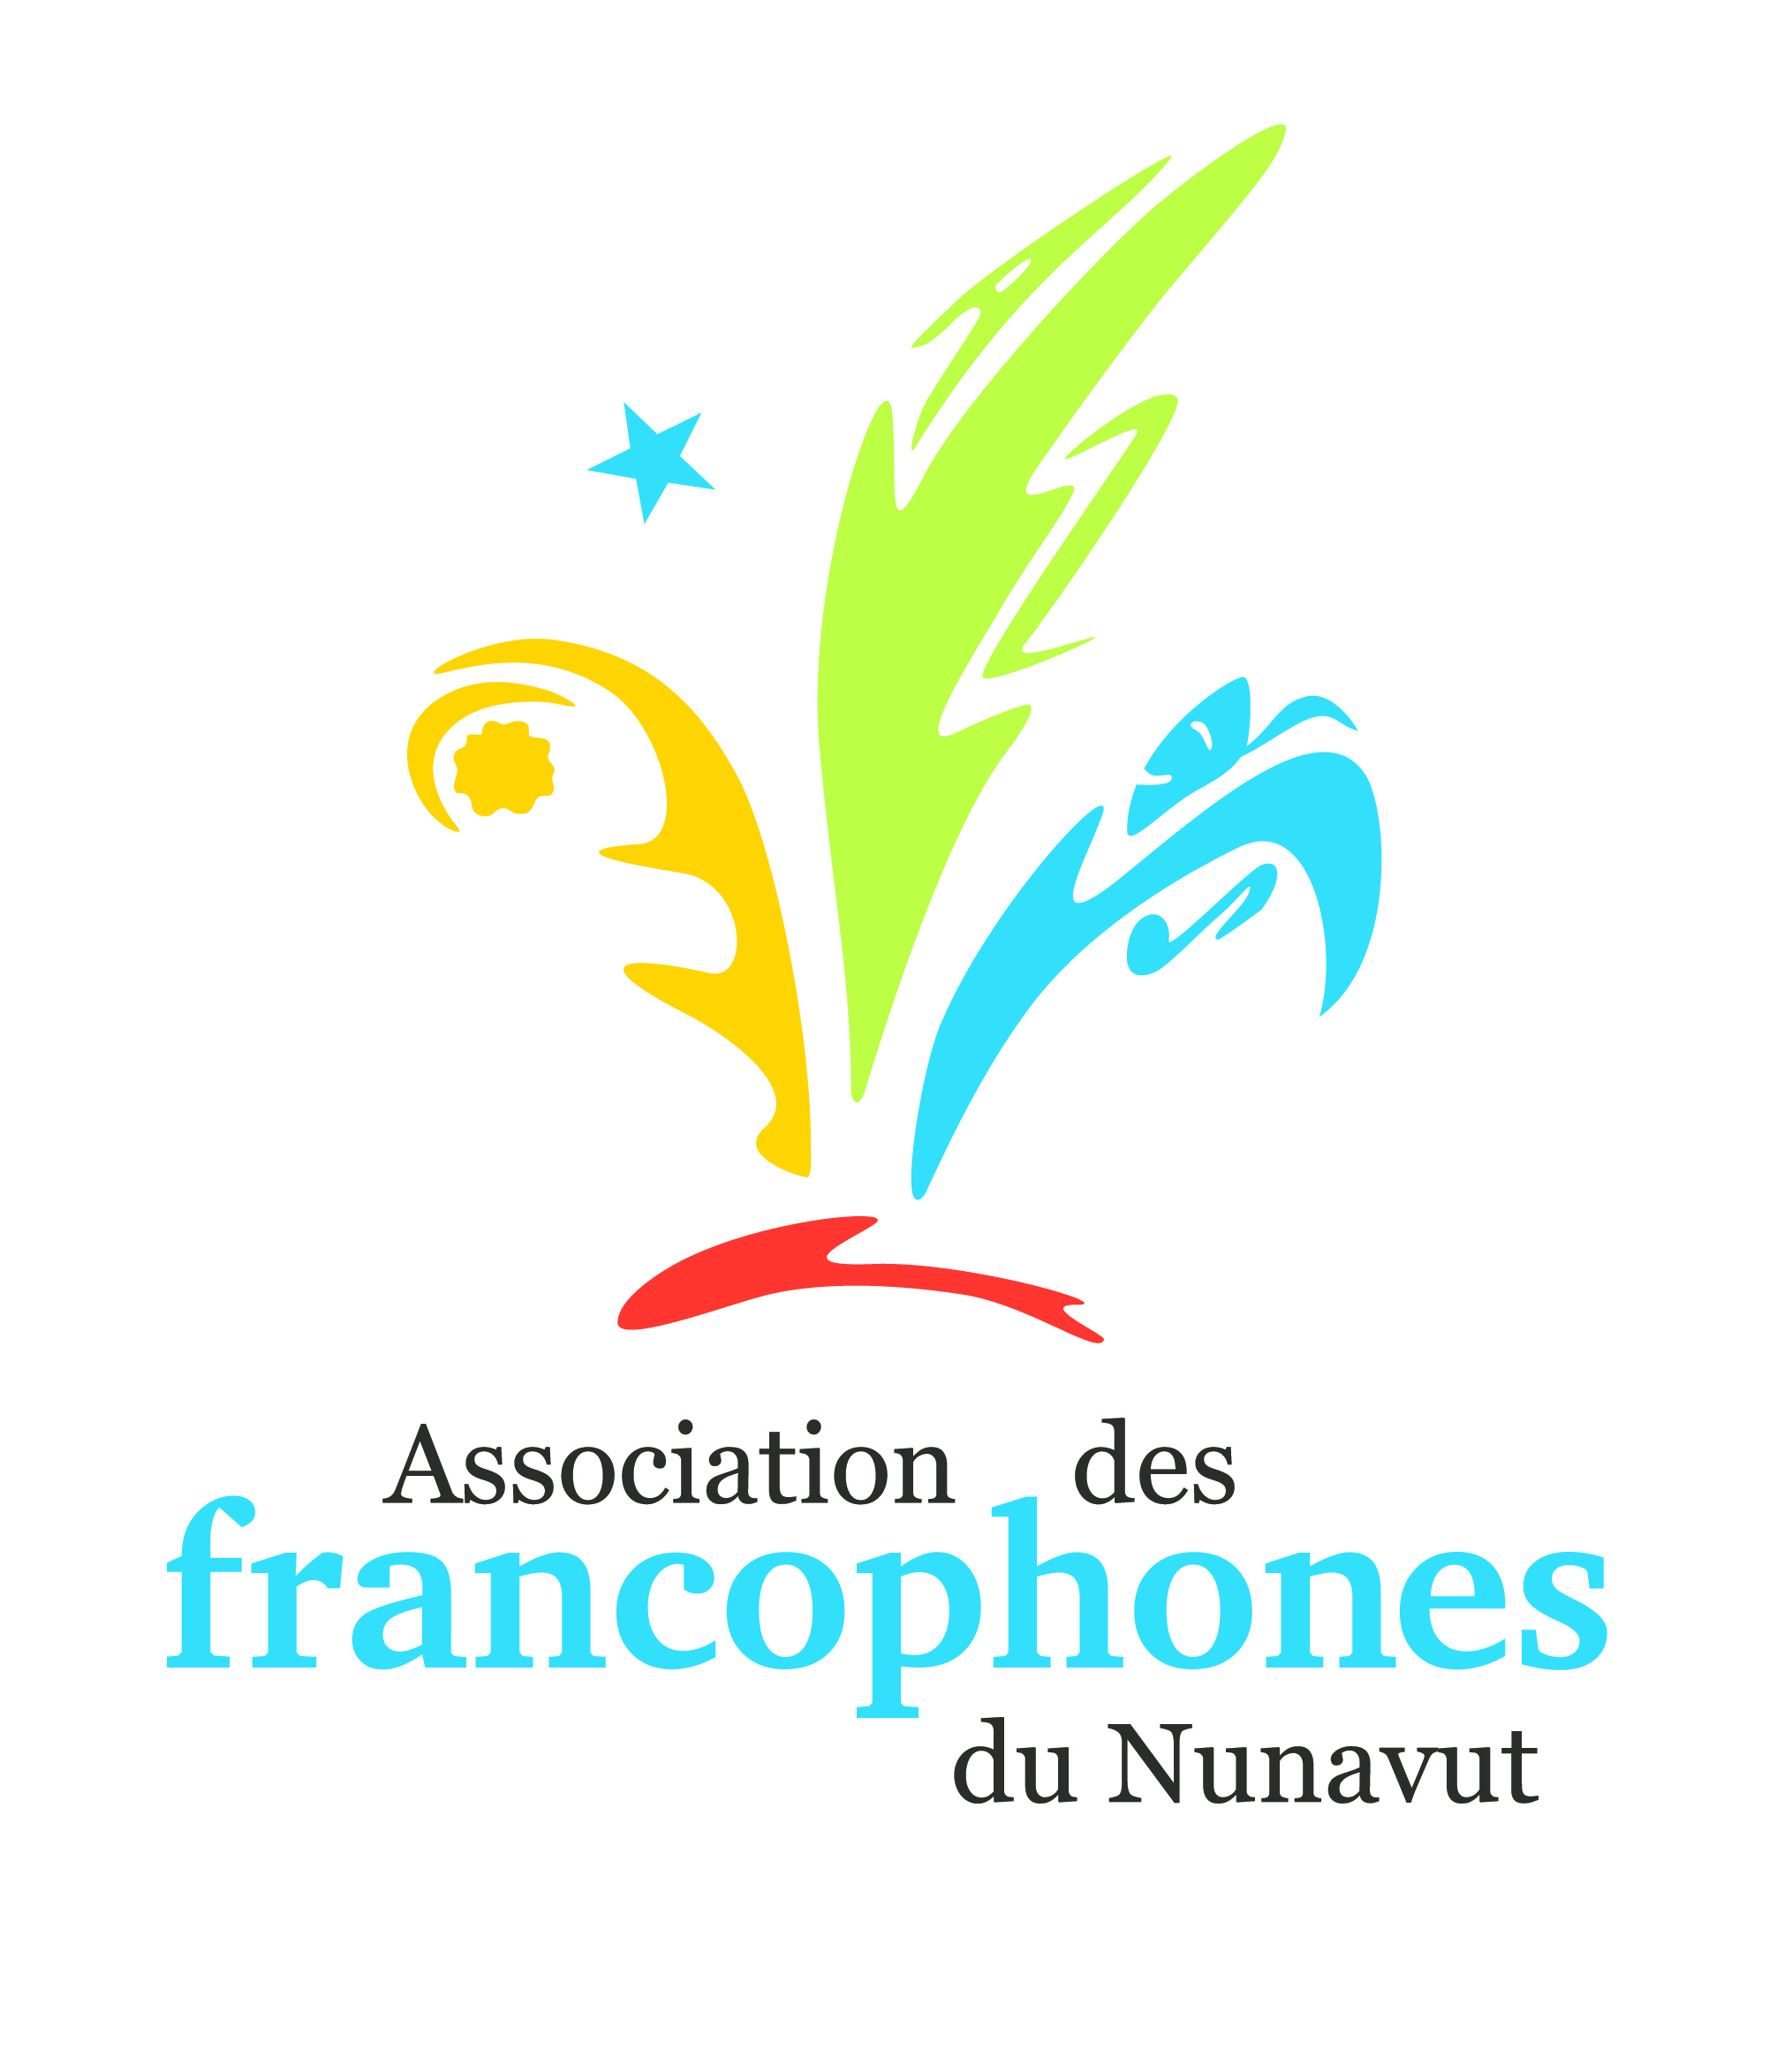 Association des francophones du Nunavut